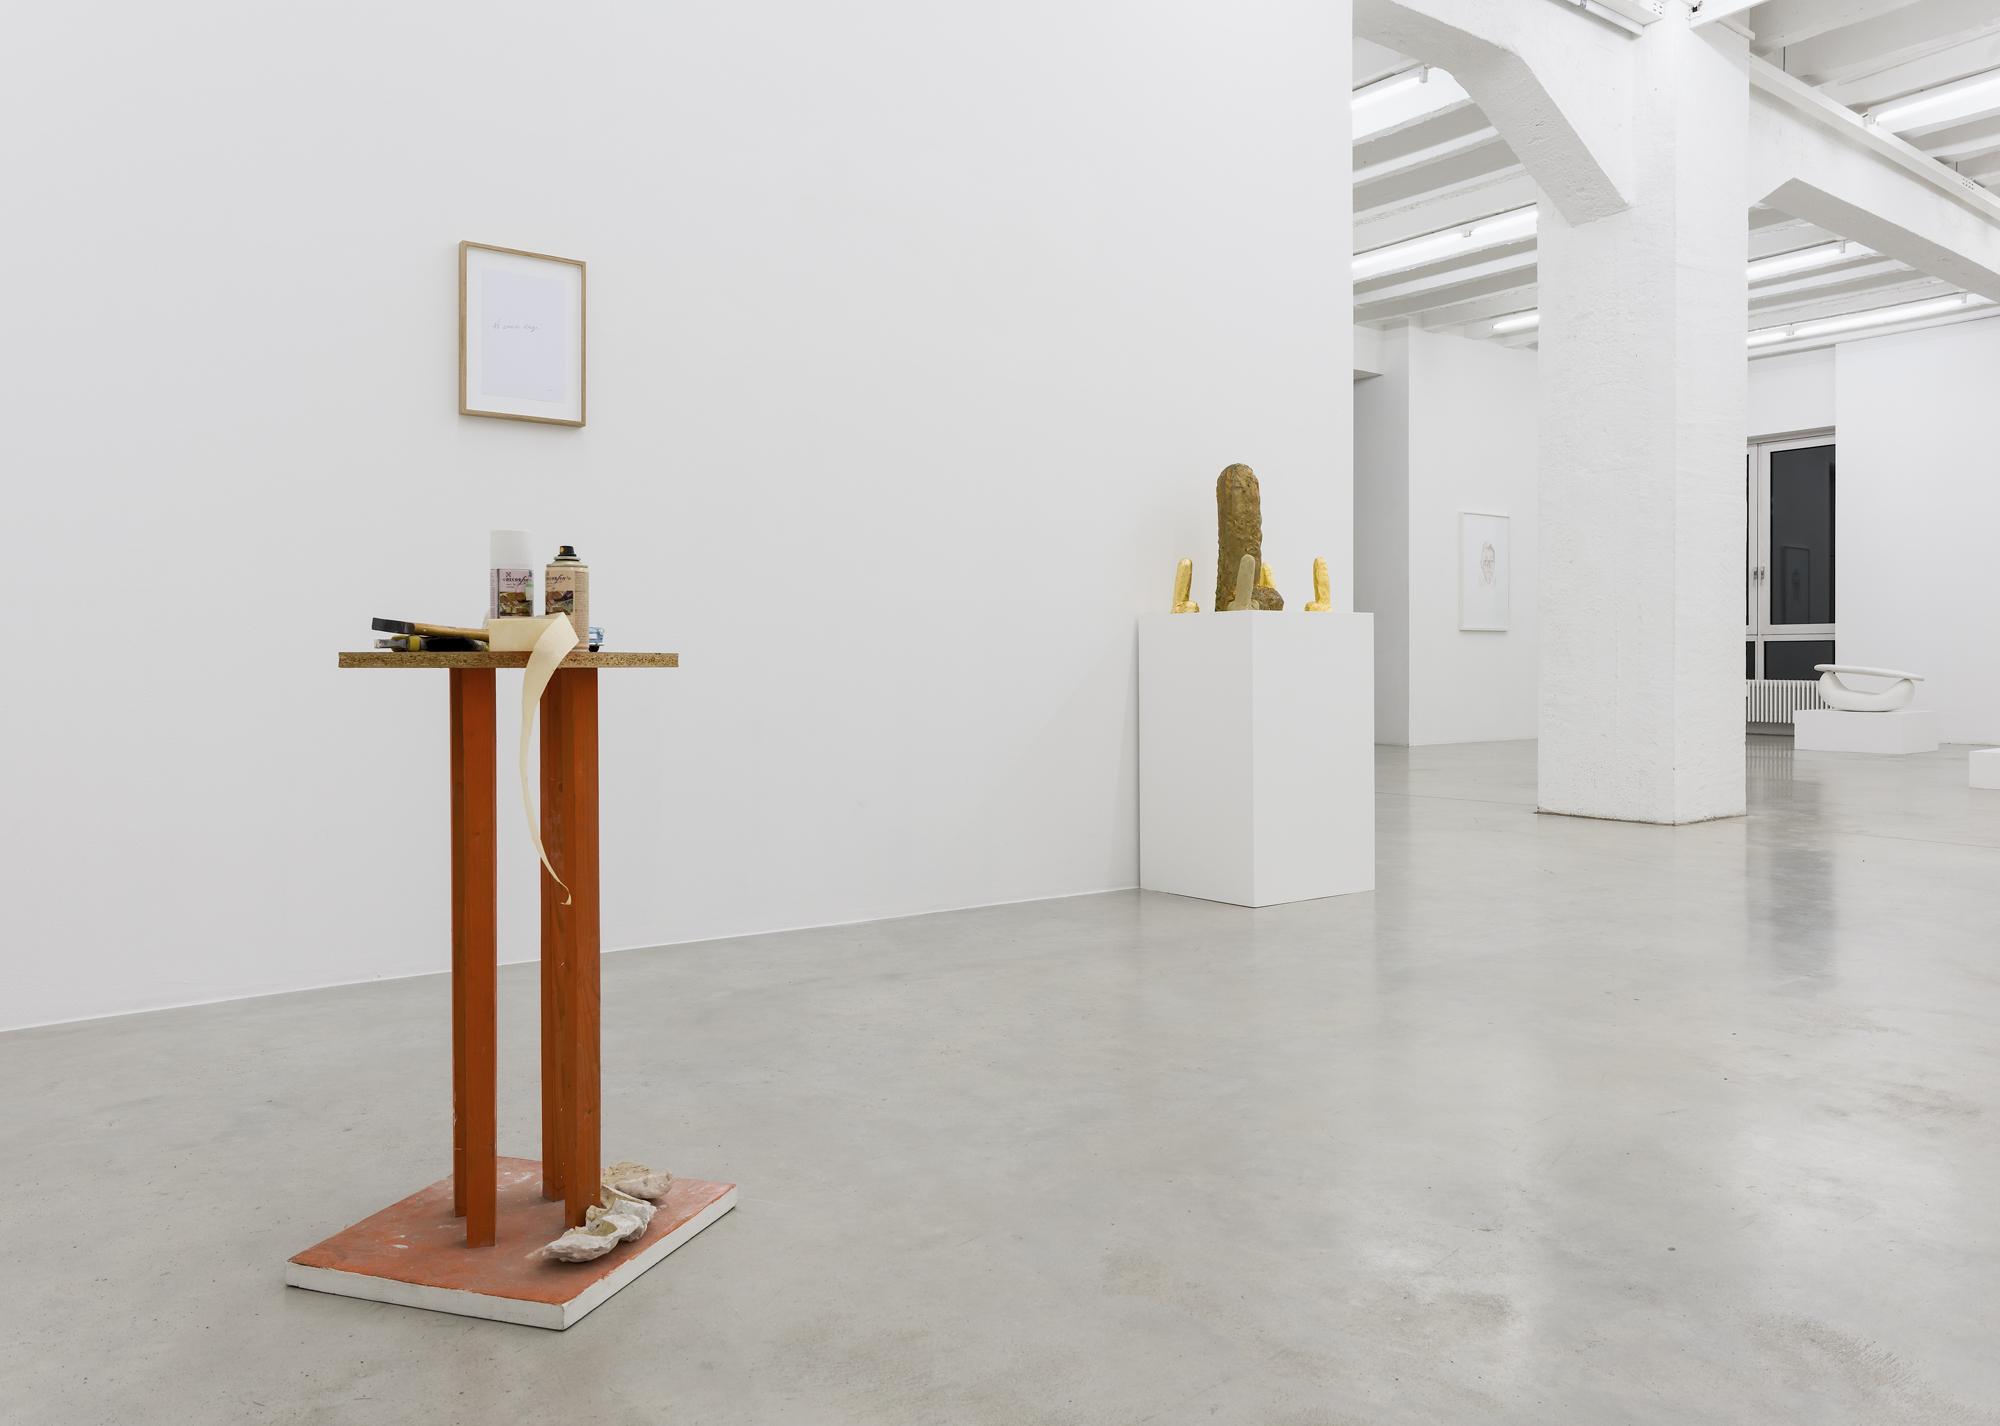 Ivan Kožarić, Shapes of Space, exhibition view, Galerija Gregor Podnar, Berlin, 2017. Photo: Marcus Schneider